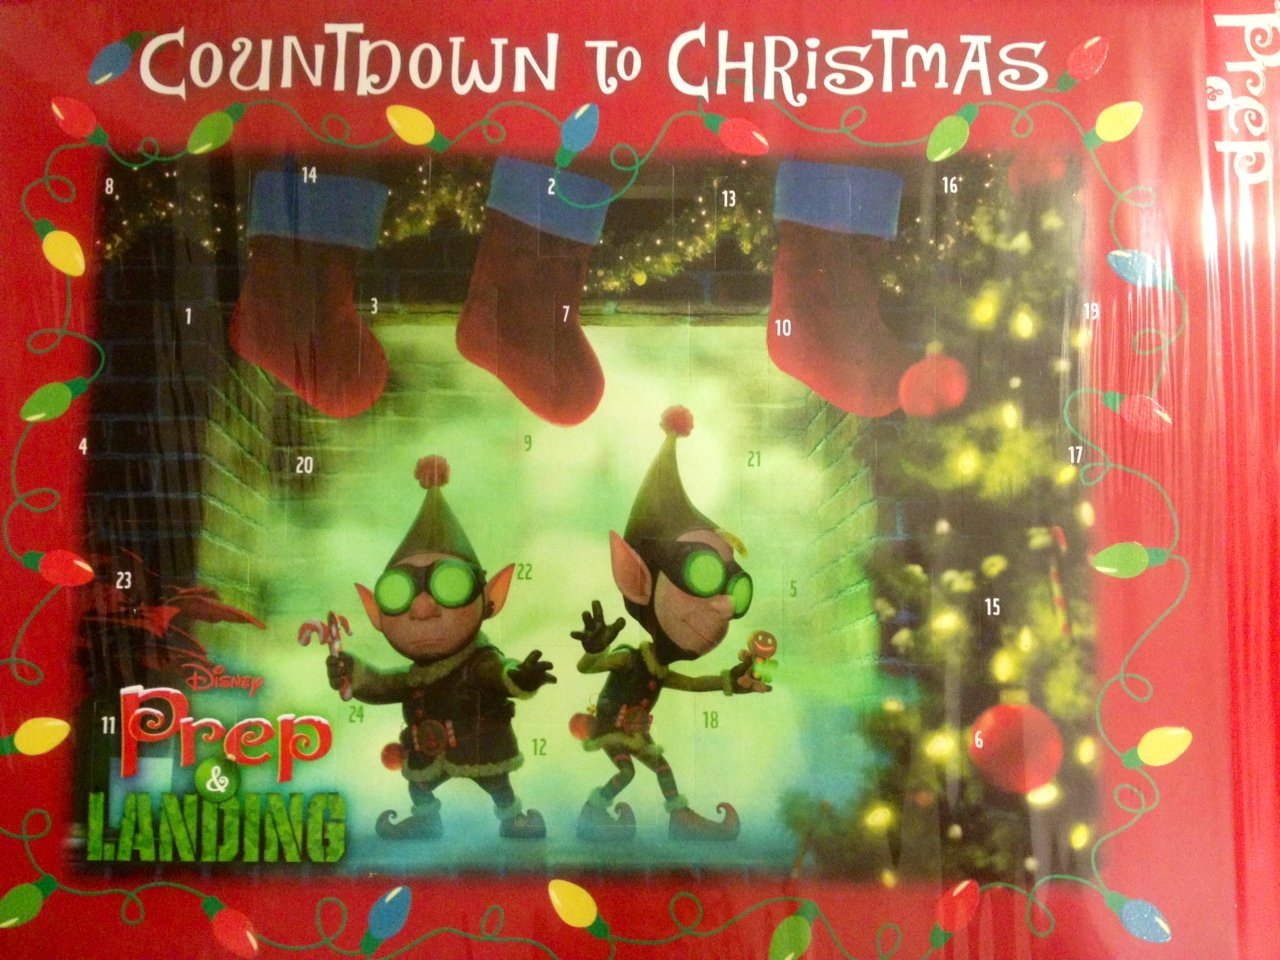 Amazon.com: Disney Prep and Landing Countdown to Christmas Advent ...